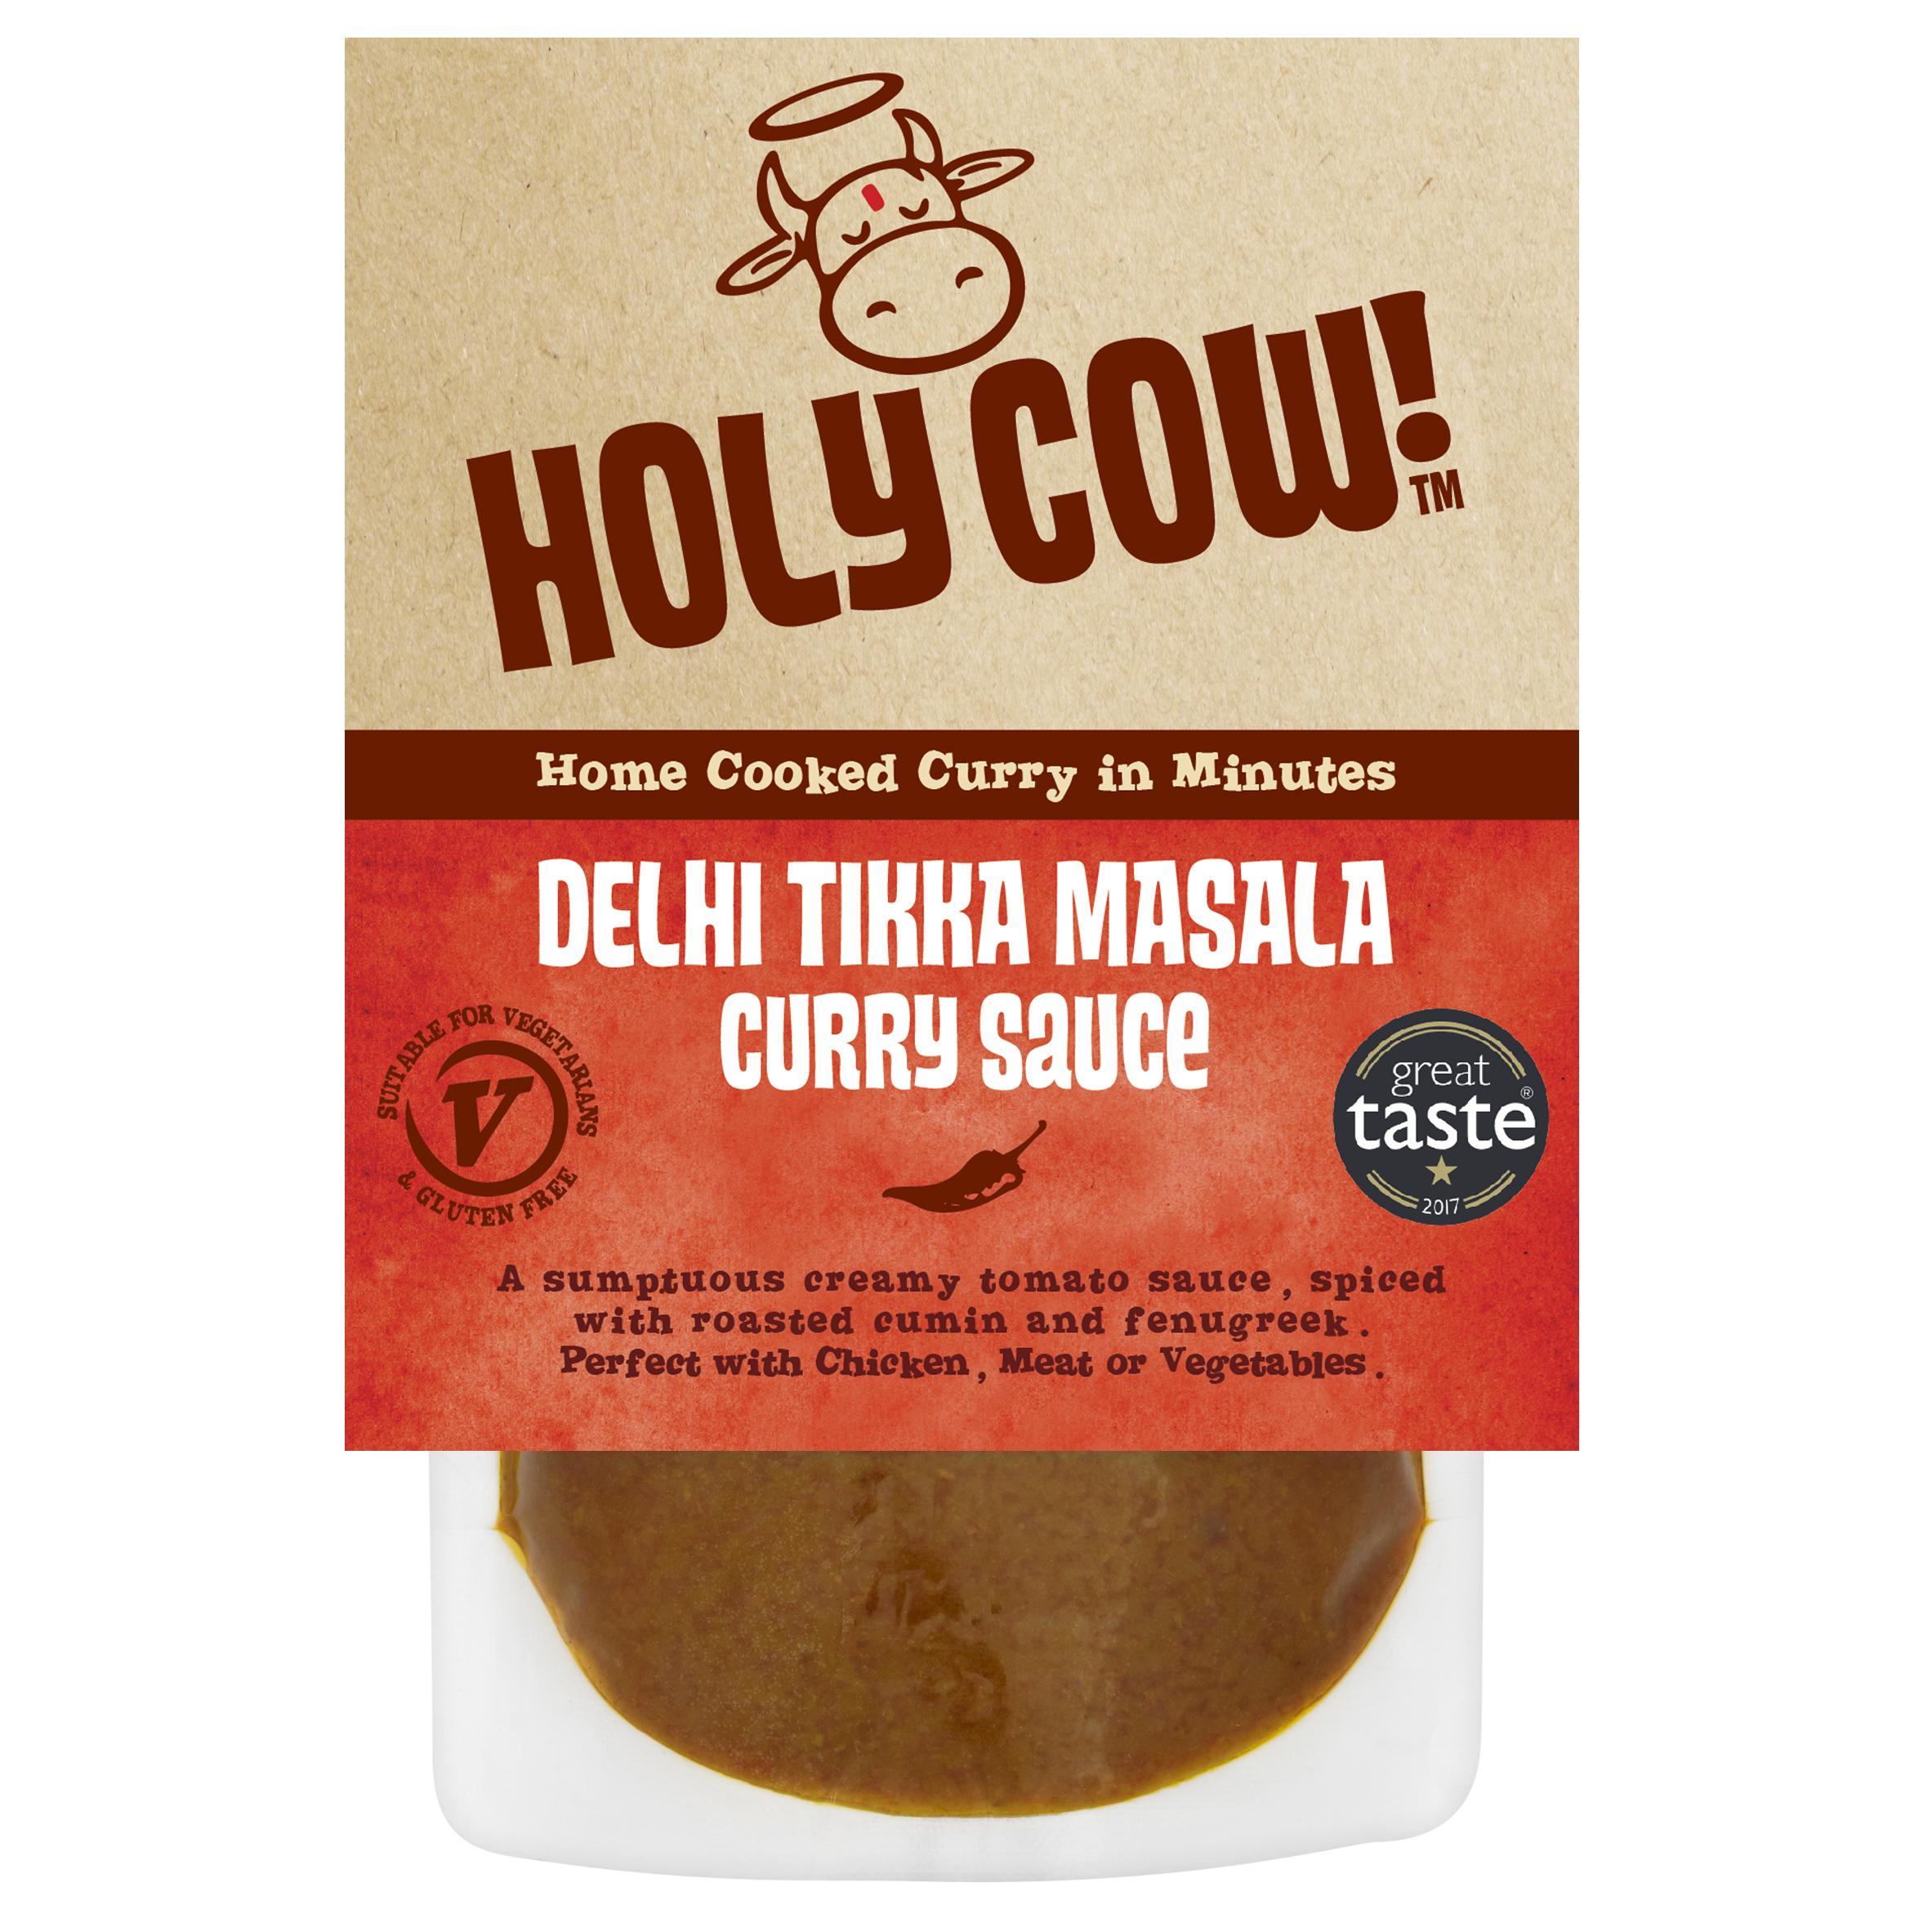 Holy Cow! Dehli Tikka Masala Curry Sauce